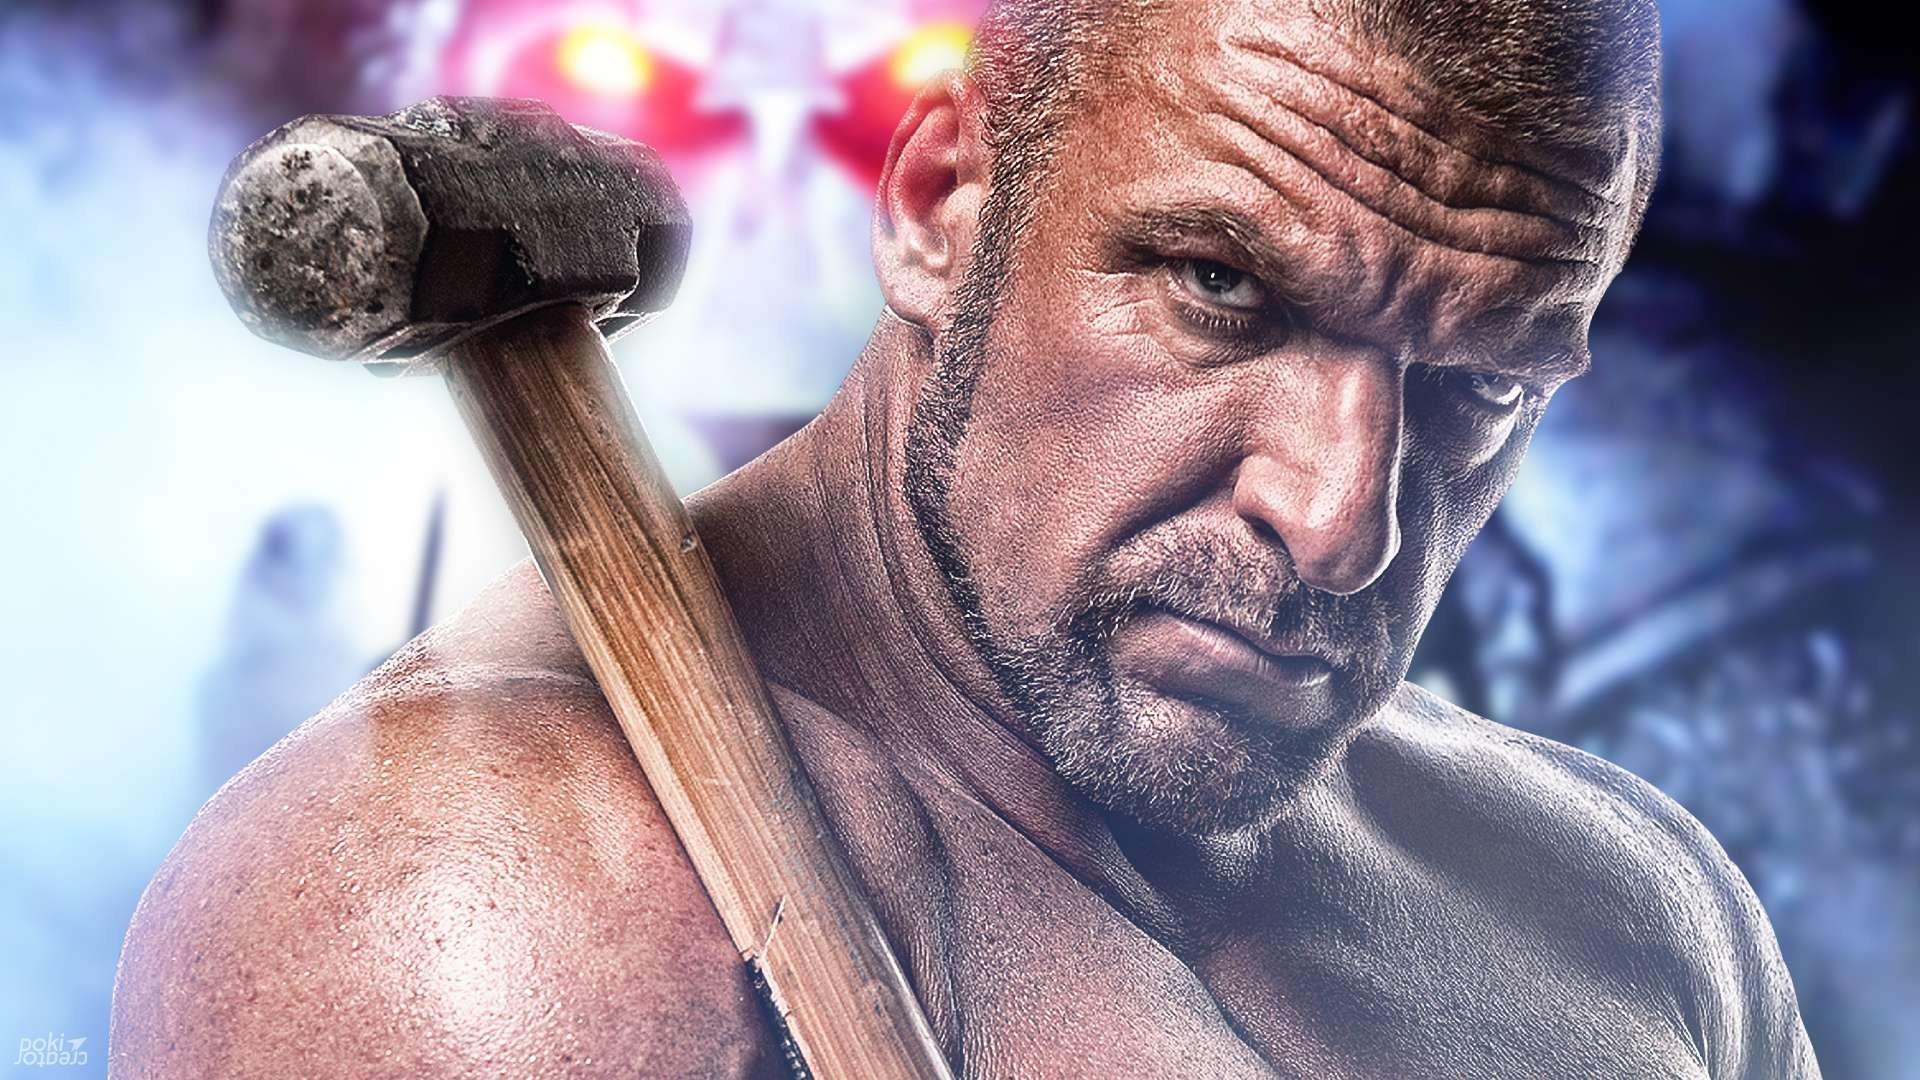 Wallpapers – WWE Superstars, WWE Wallpapers, WWE PPV's